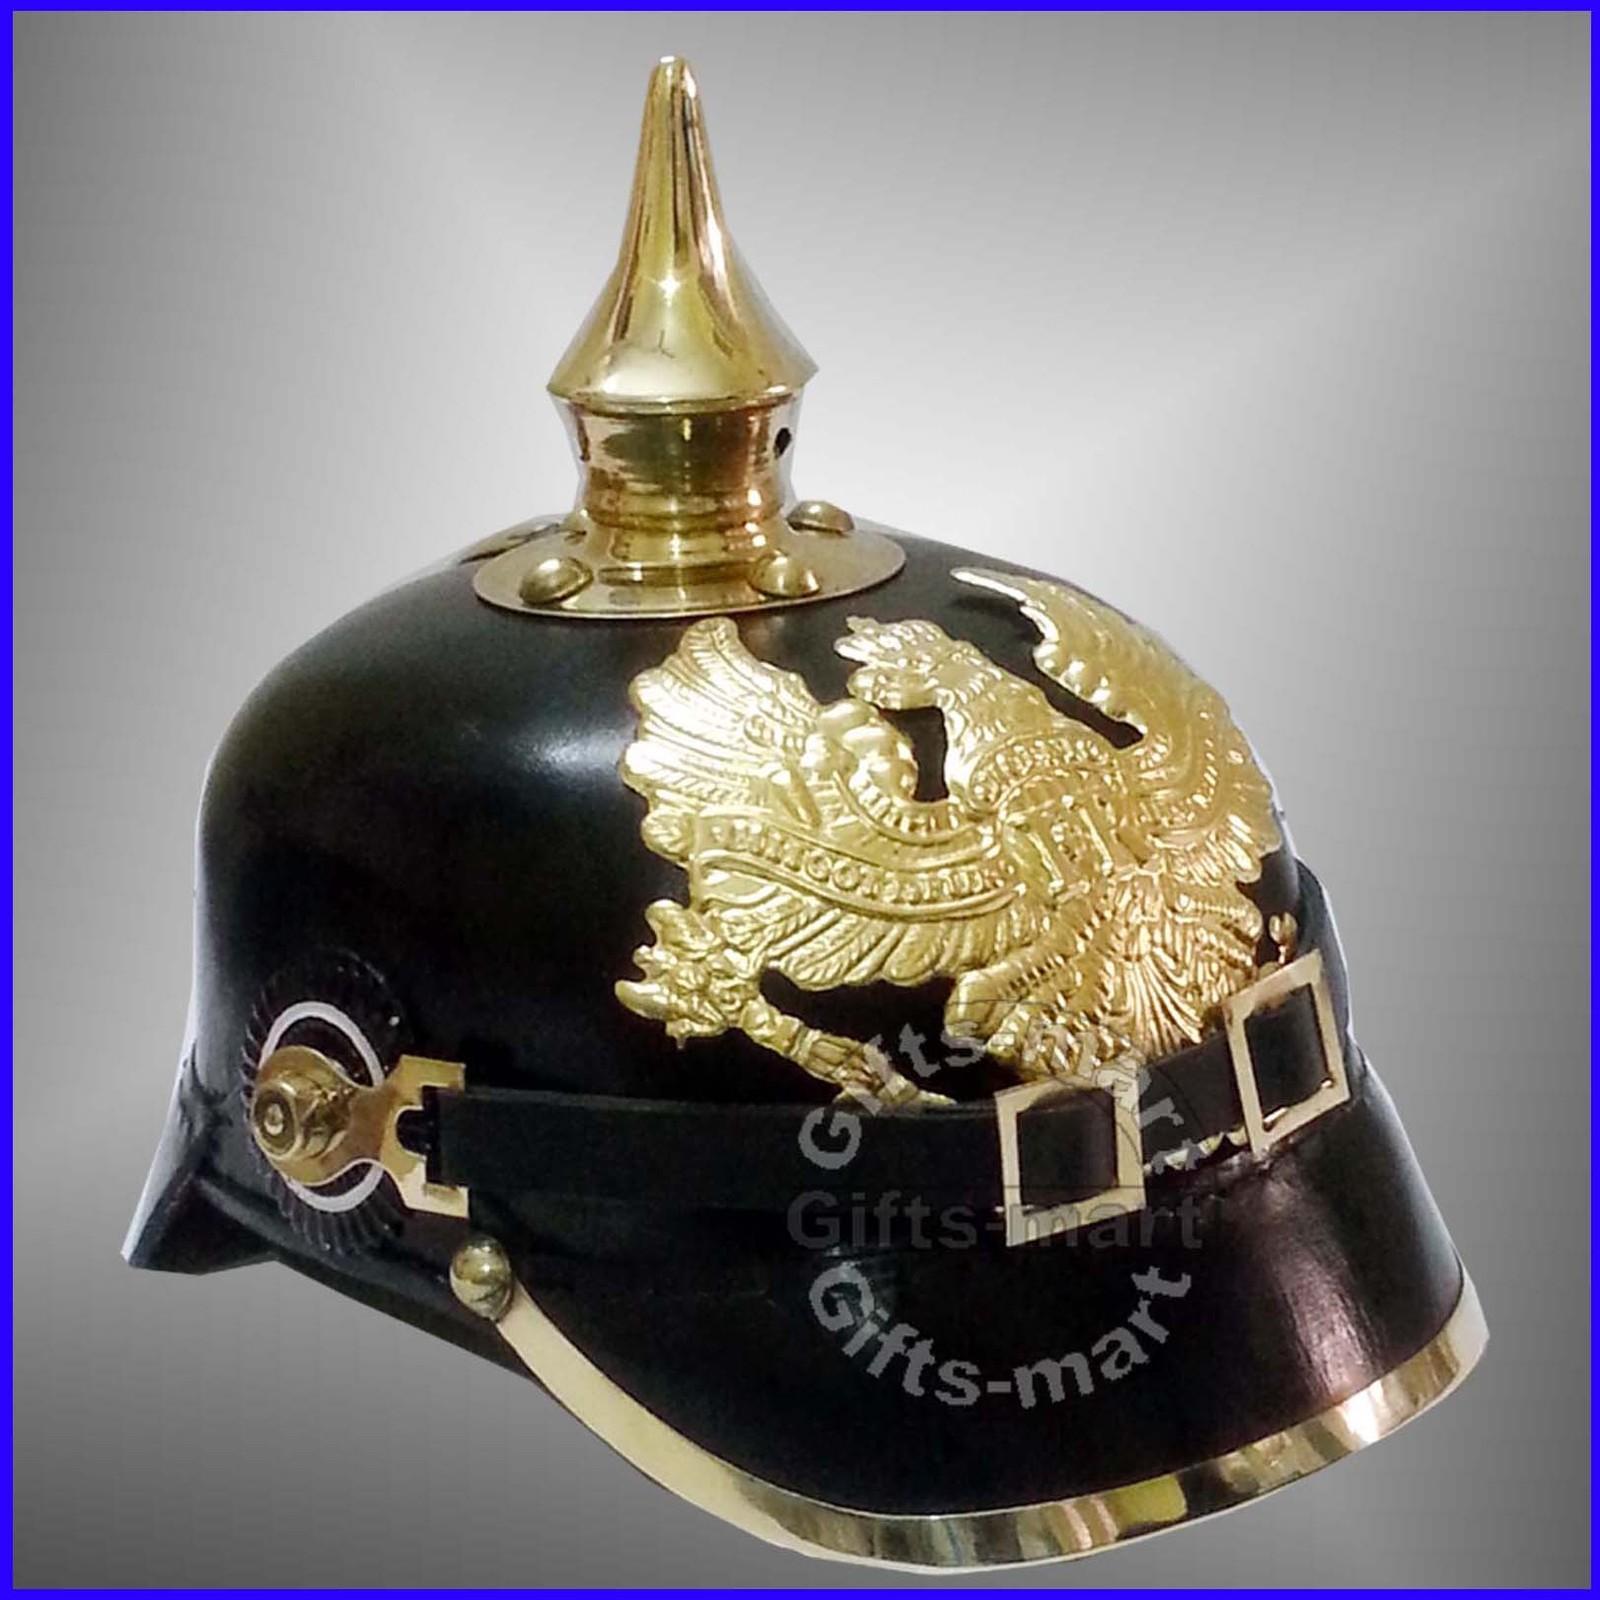 Prussian Leather Helmet - German Officer Pickelhaube Helmet